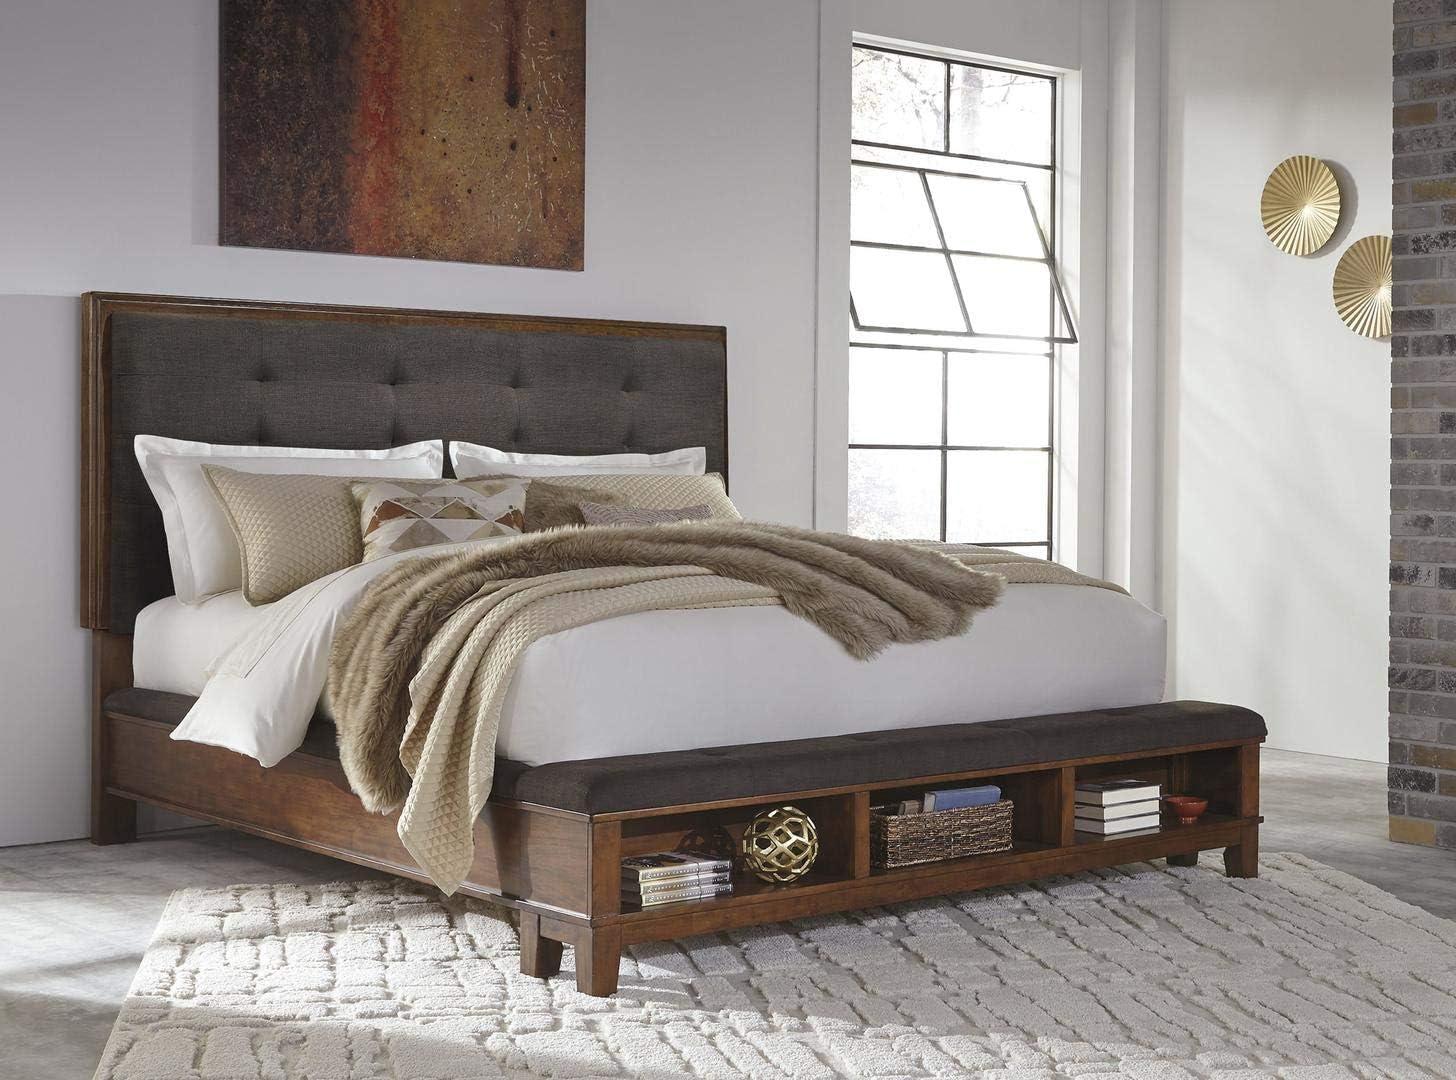 Ashley Furniture Signature Design - Ralene Queen Upholstered Panel Headboard - Component Piece - Medium Brown